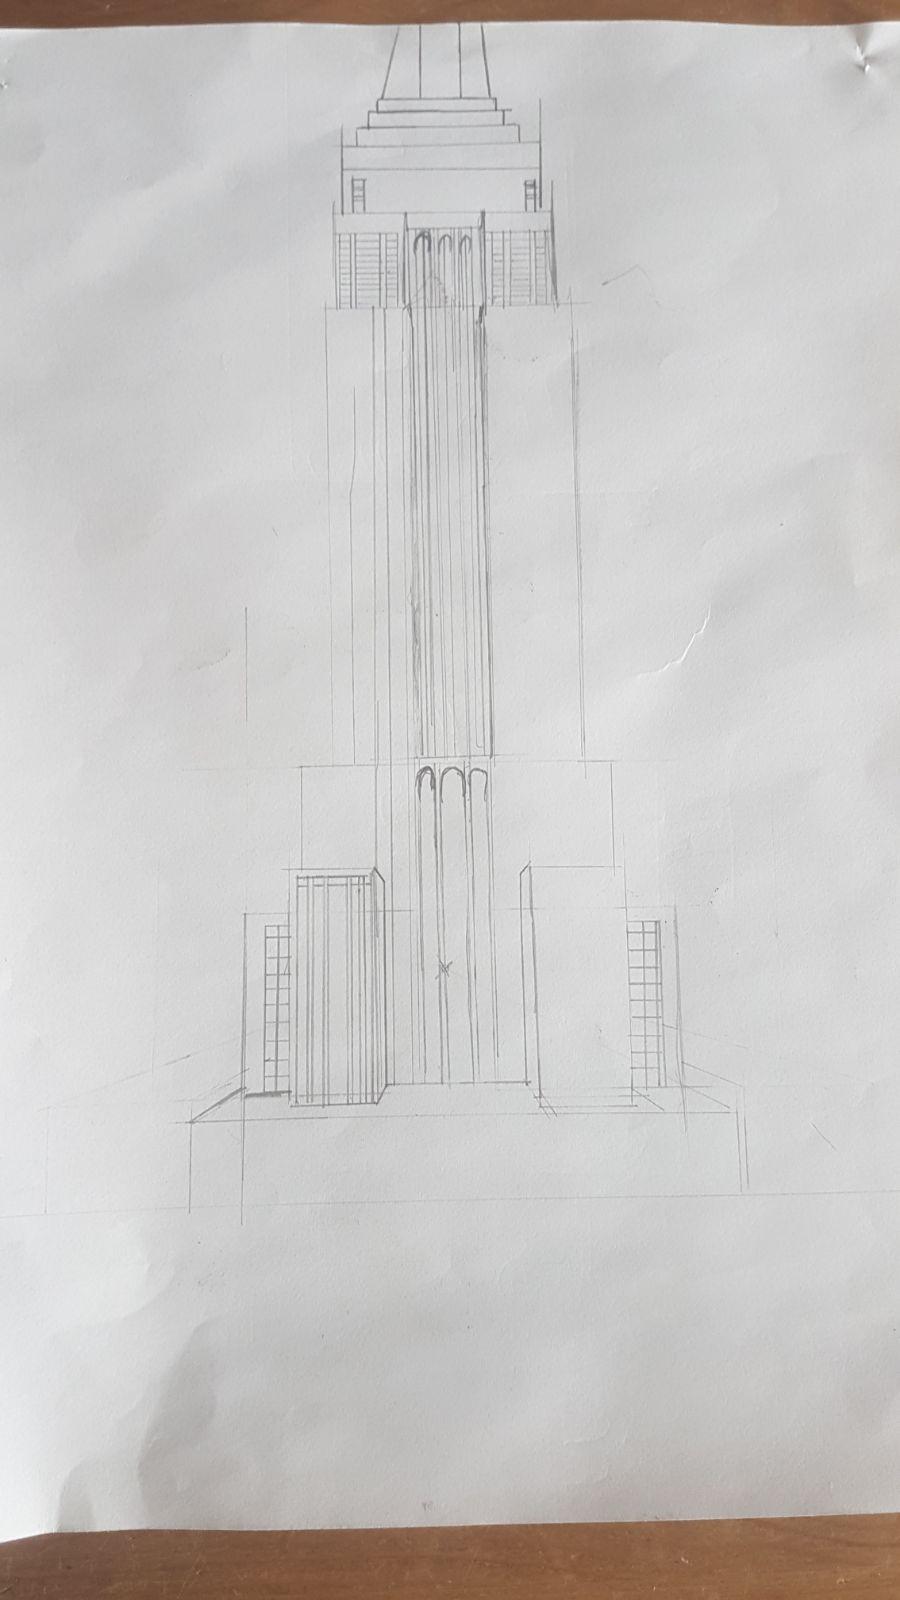 tekening empire state building